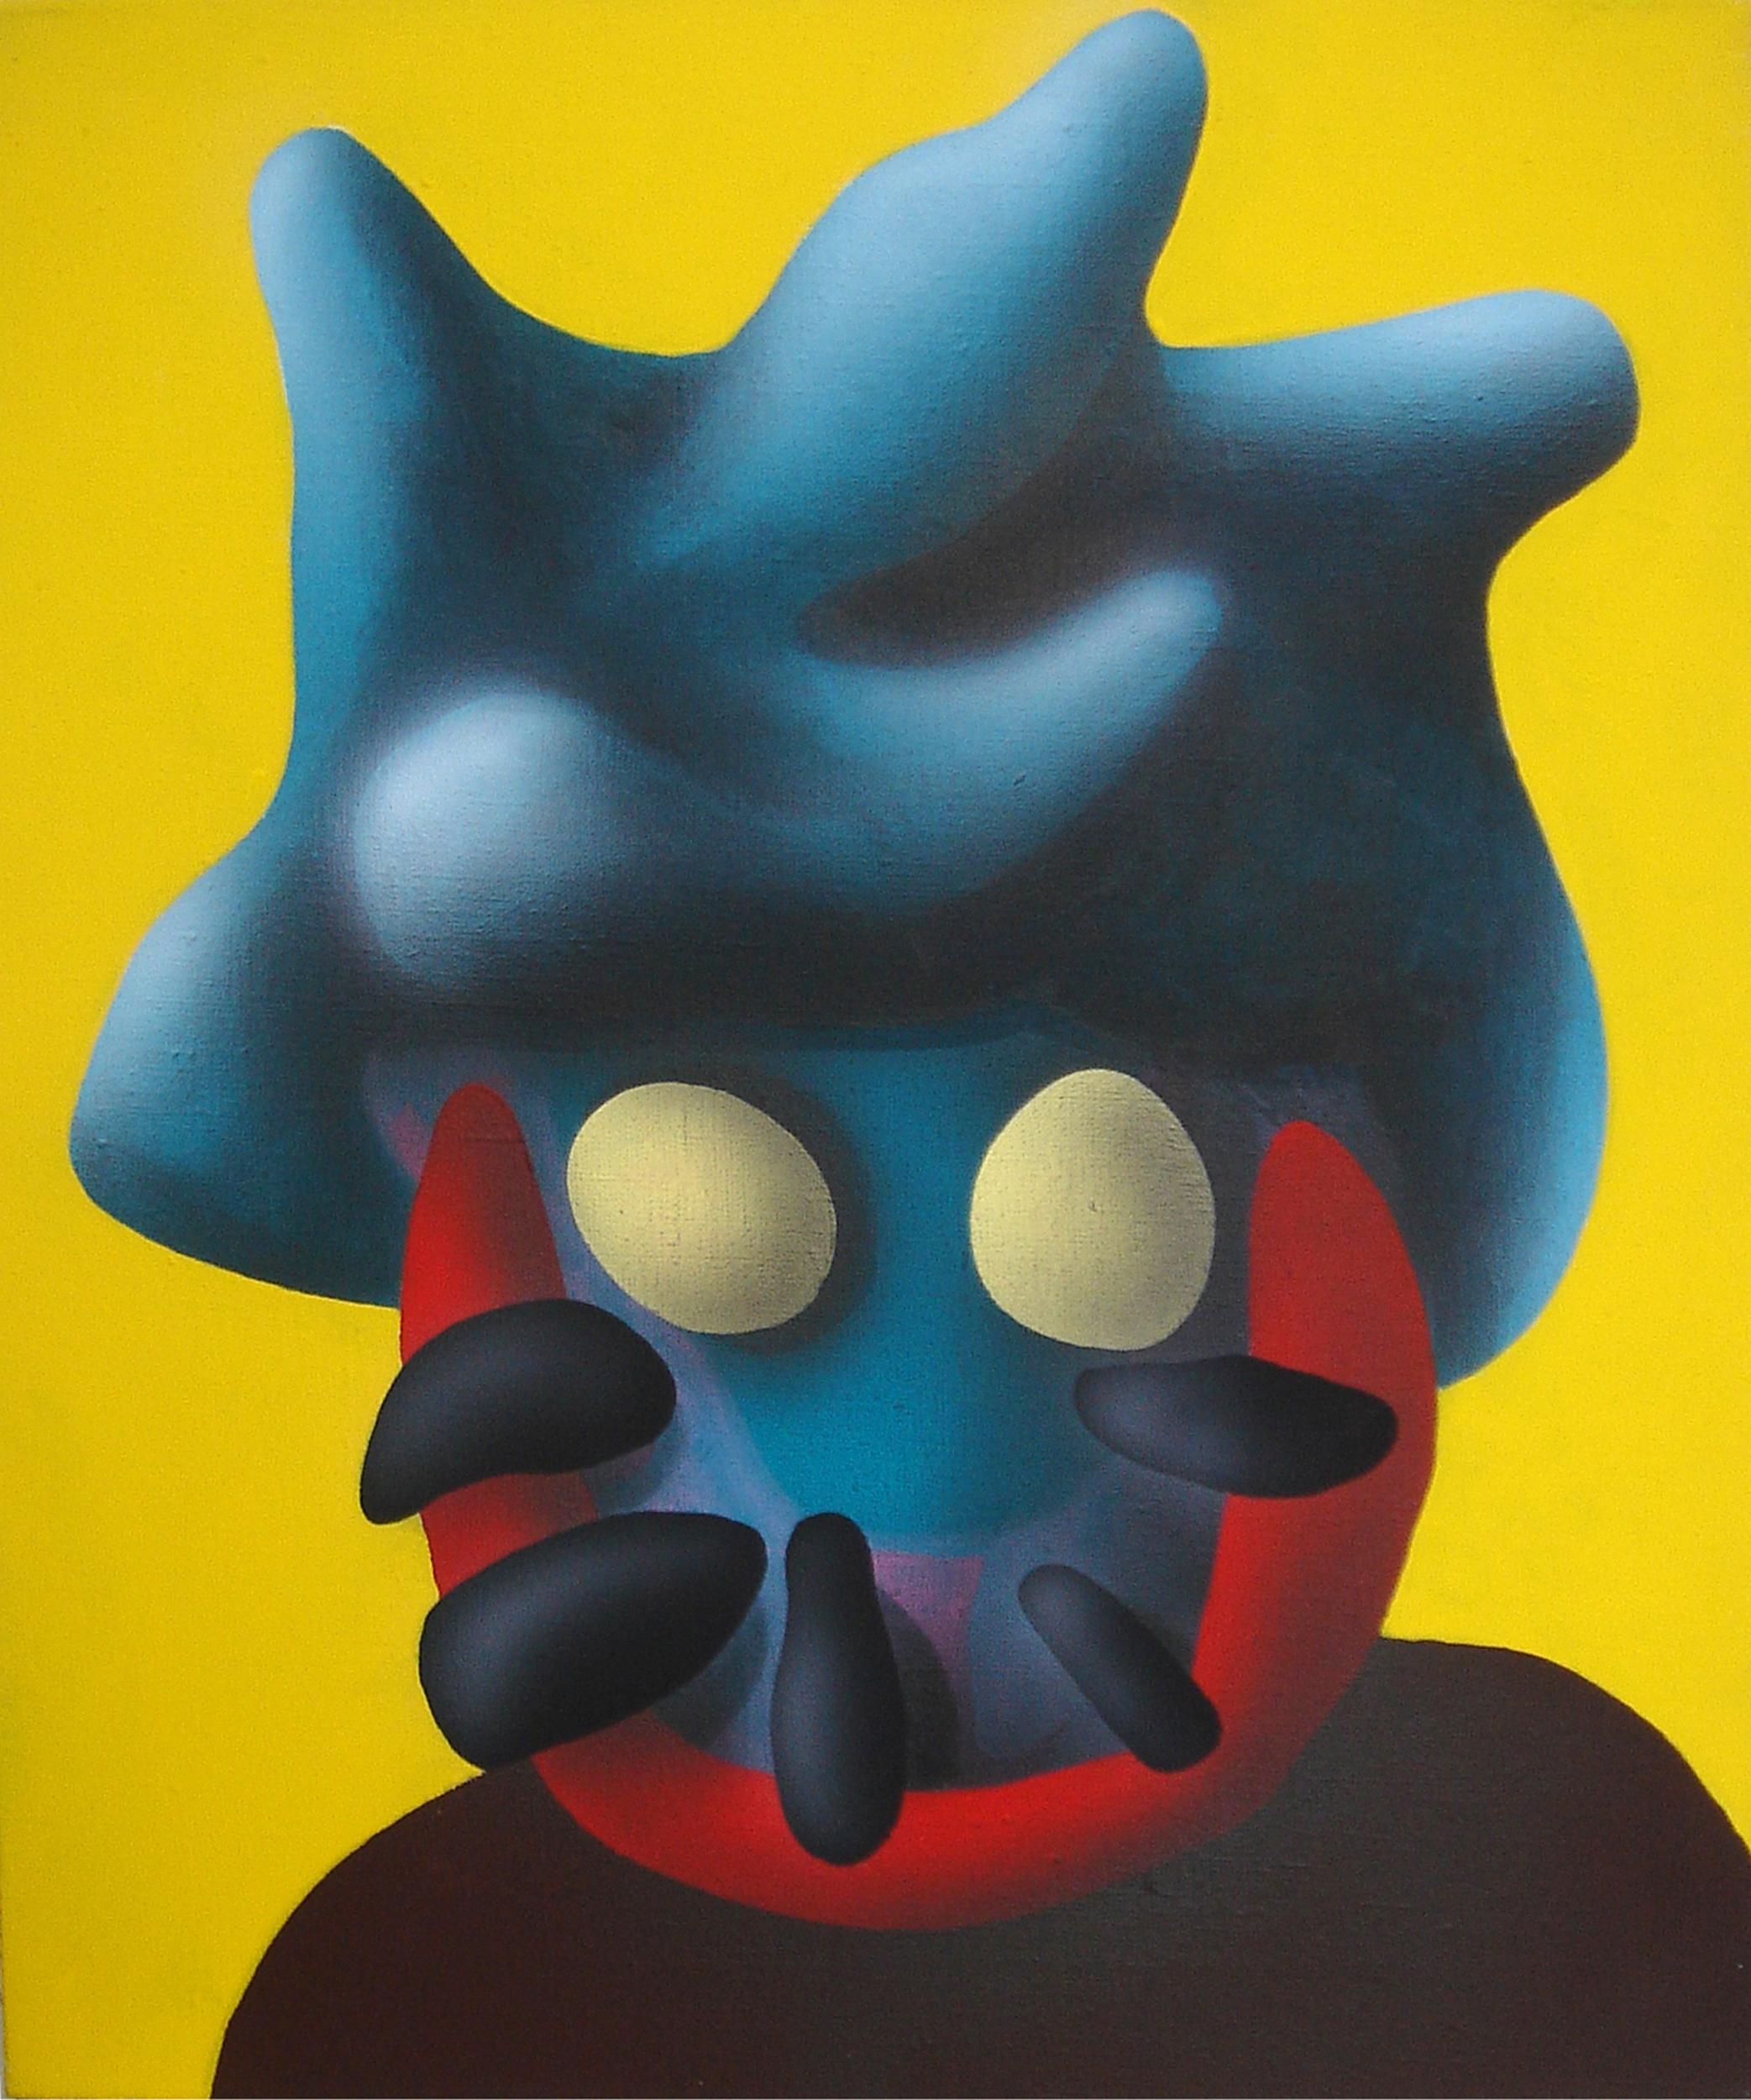 Pepa, 2007, acrylic on canvas, 50 x 40 cm